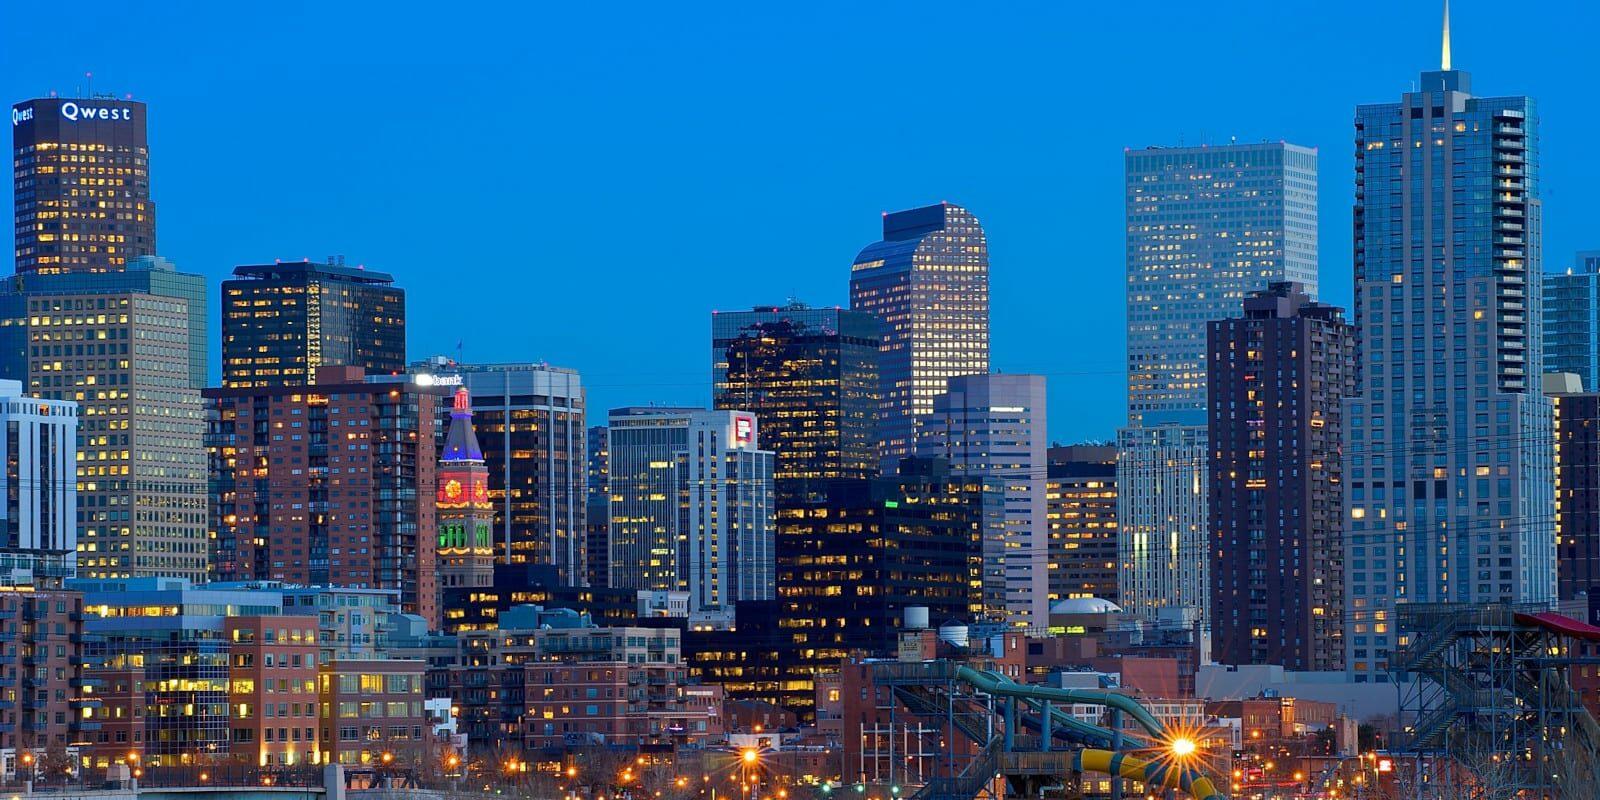 Image of the Denver skyline at night